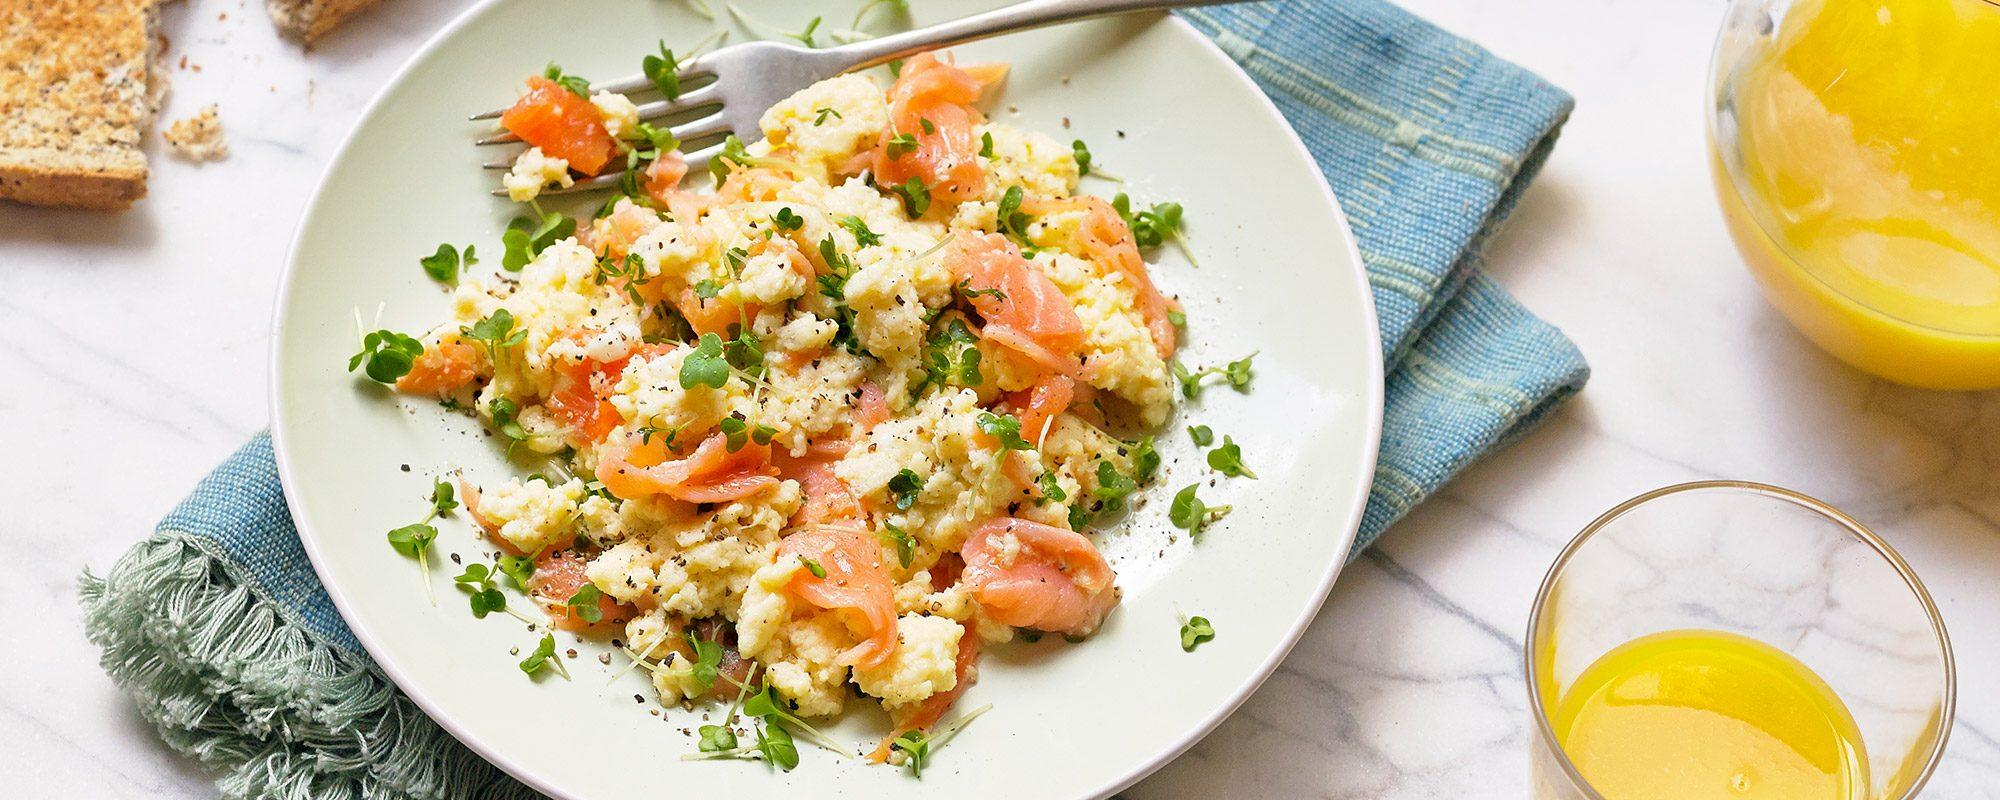 salad cress, smoked salmon and scrambled eggs